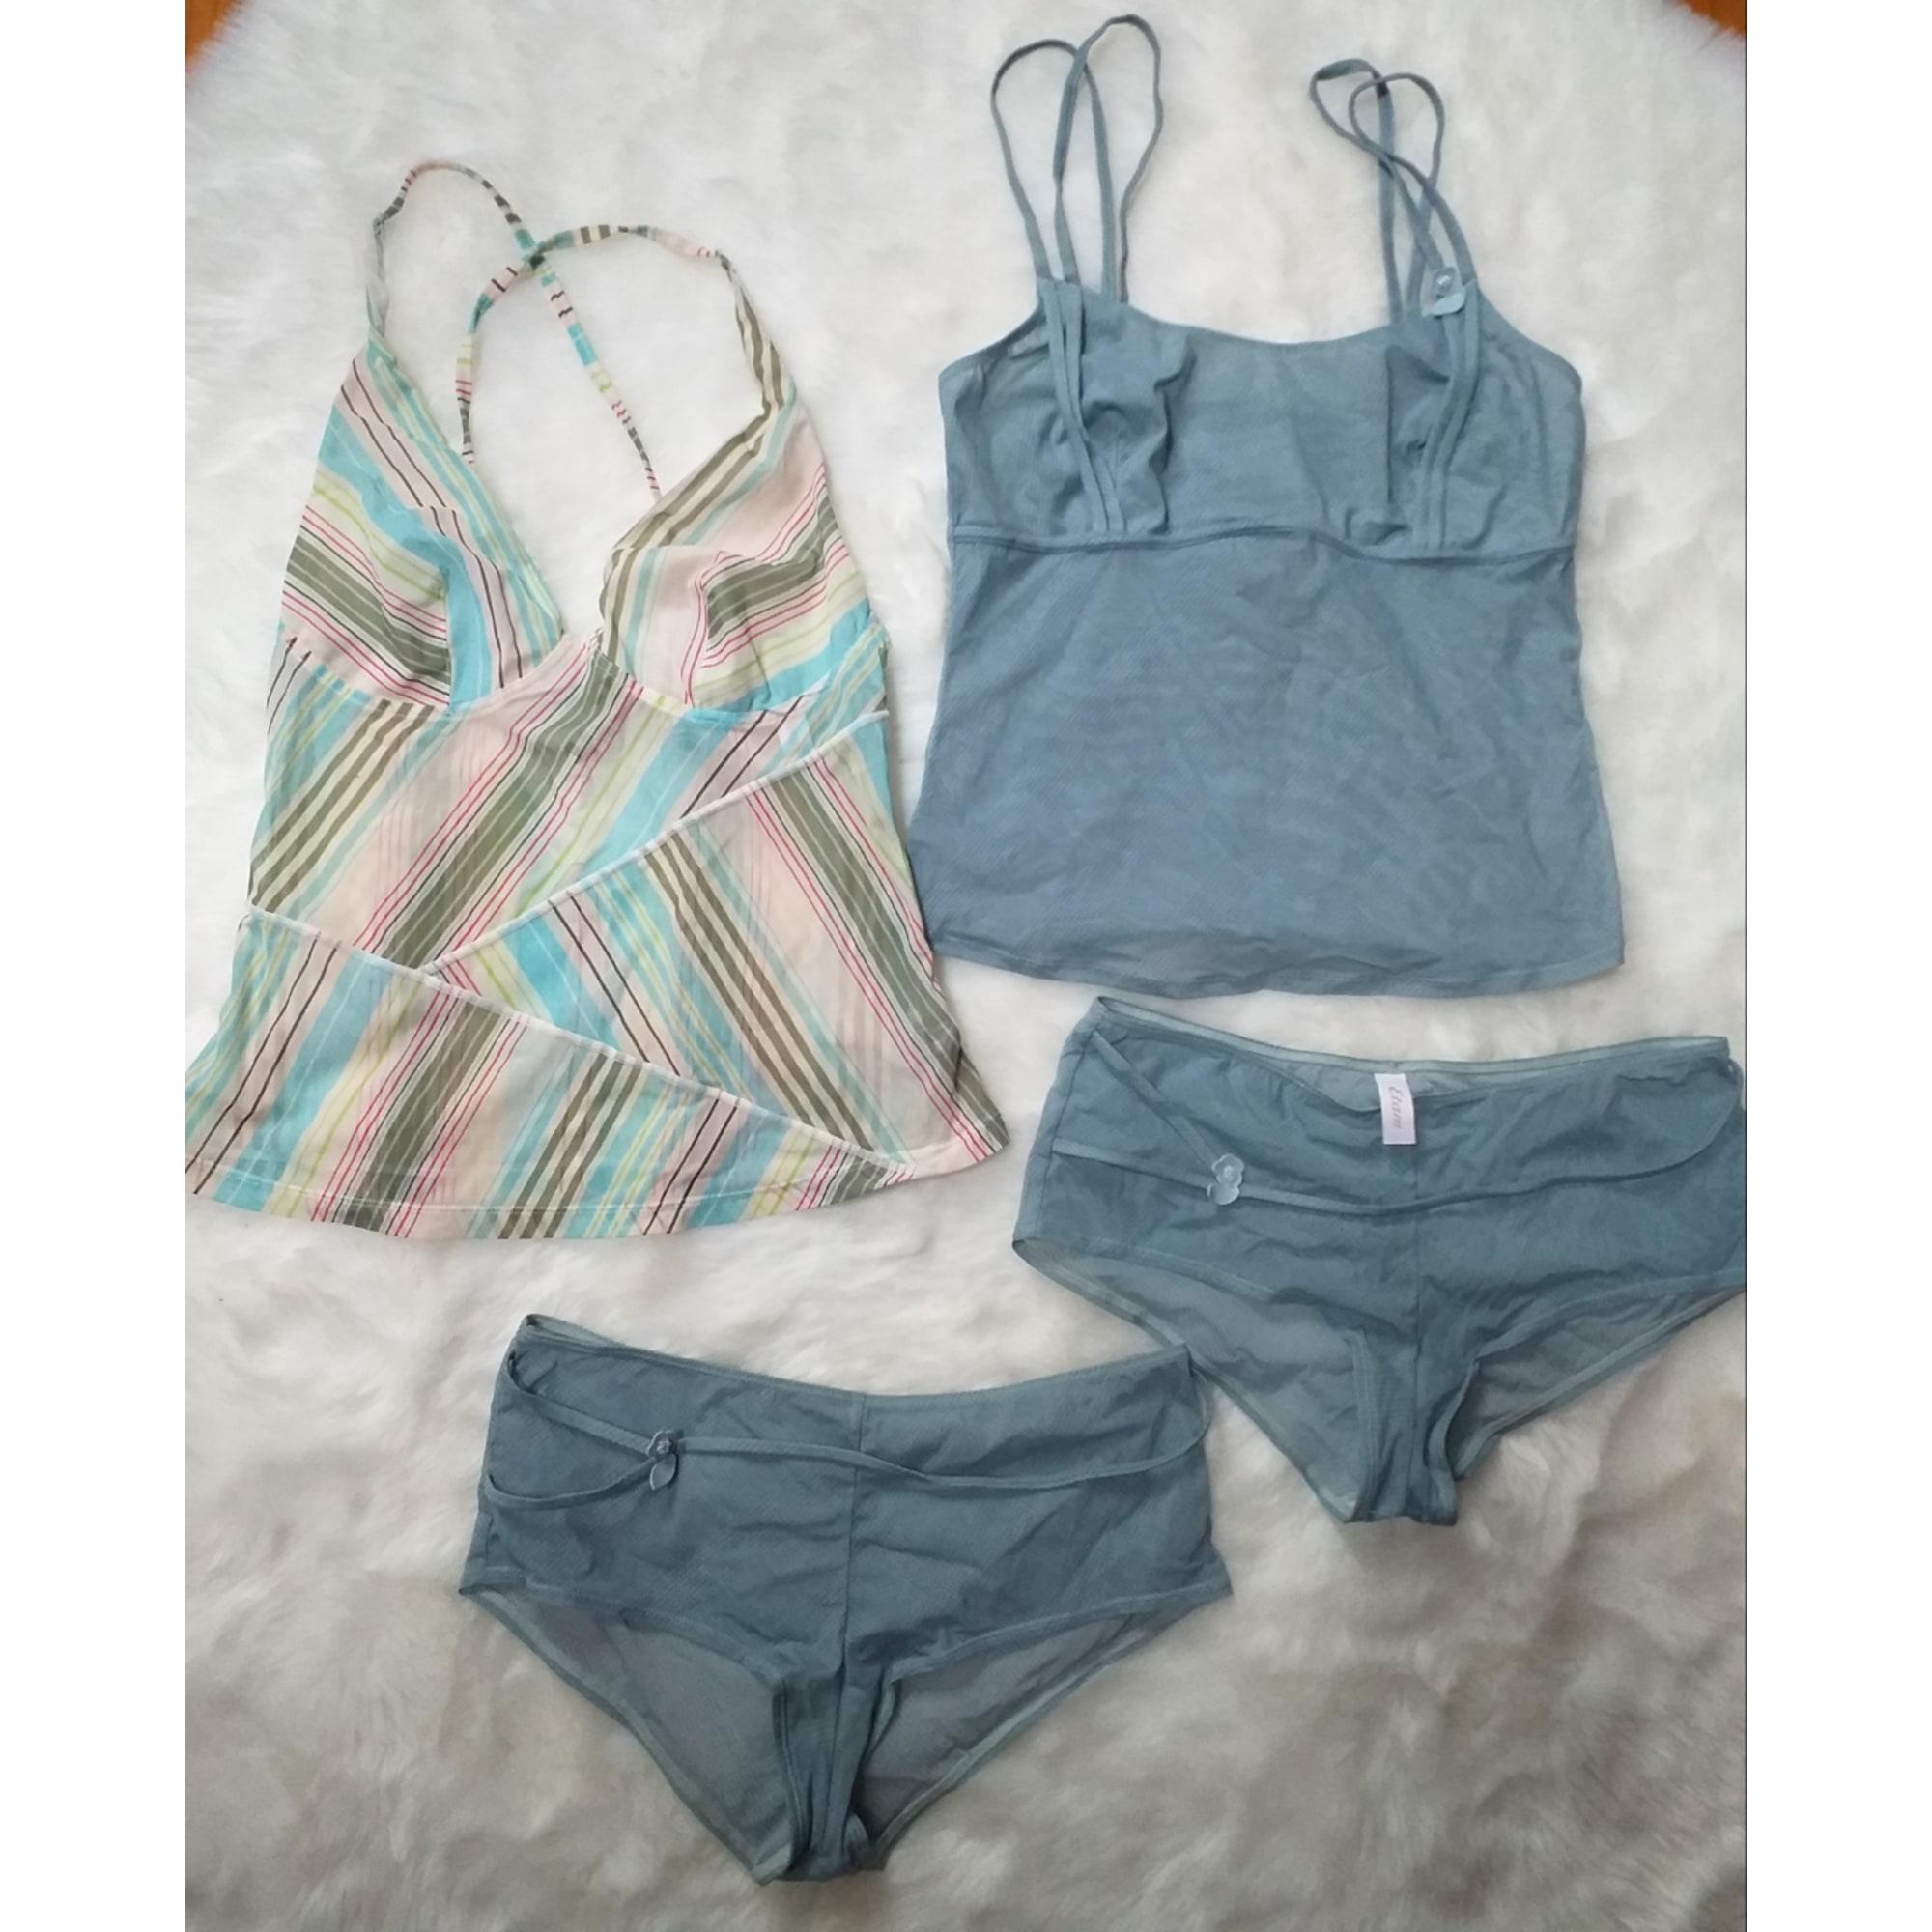 Ensemble, parure lingerie ETAM LINGERIE Bleu, bleu marine, bleu turquoise